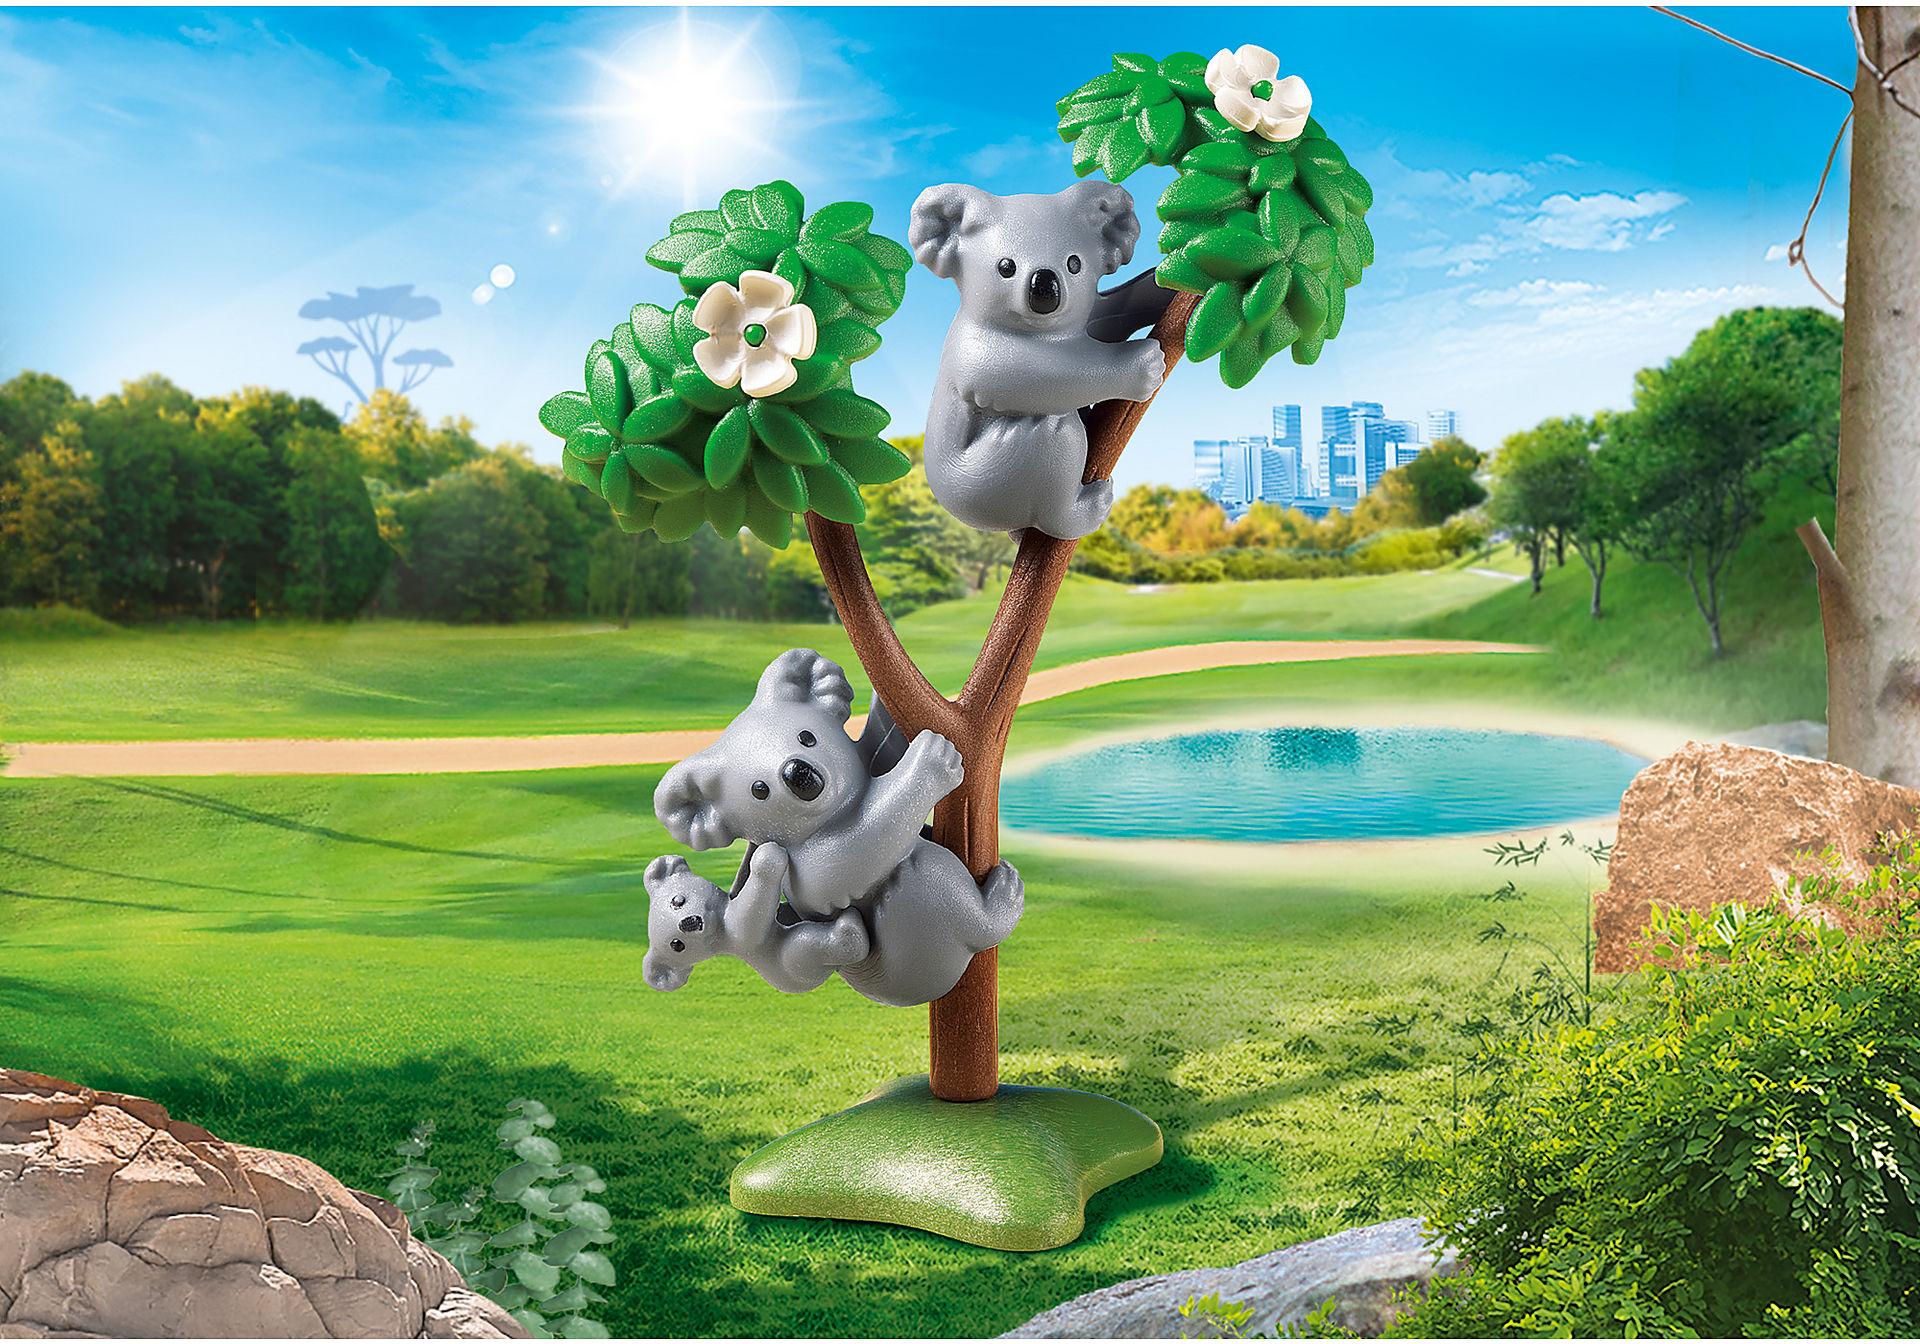 70352  2 koalabjørne med baby zoom image1